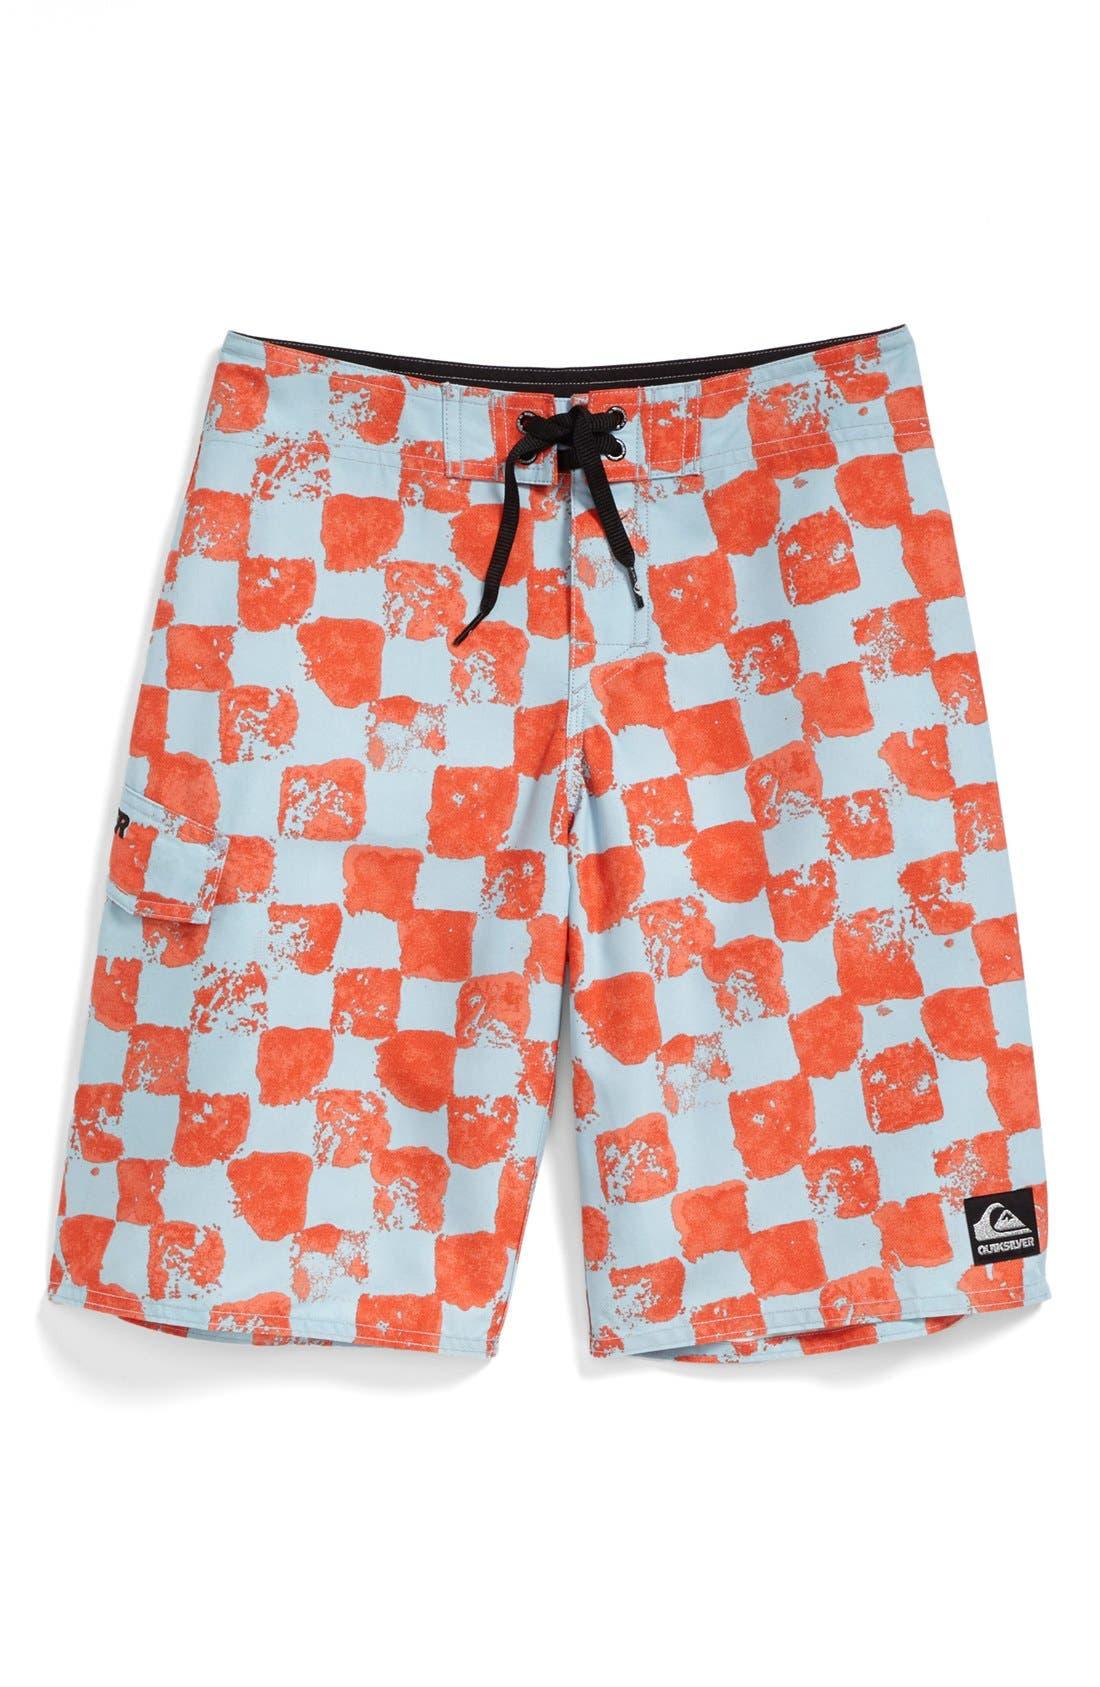 Main Image - Quiksilver 'Magic Palm' Board Shorts (Big Boys)